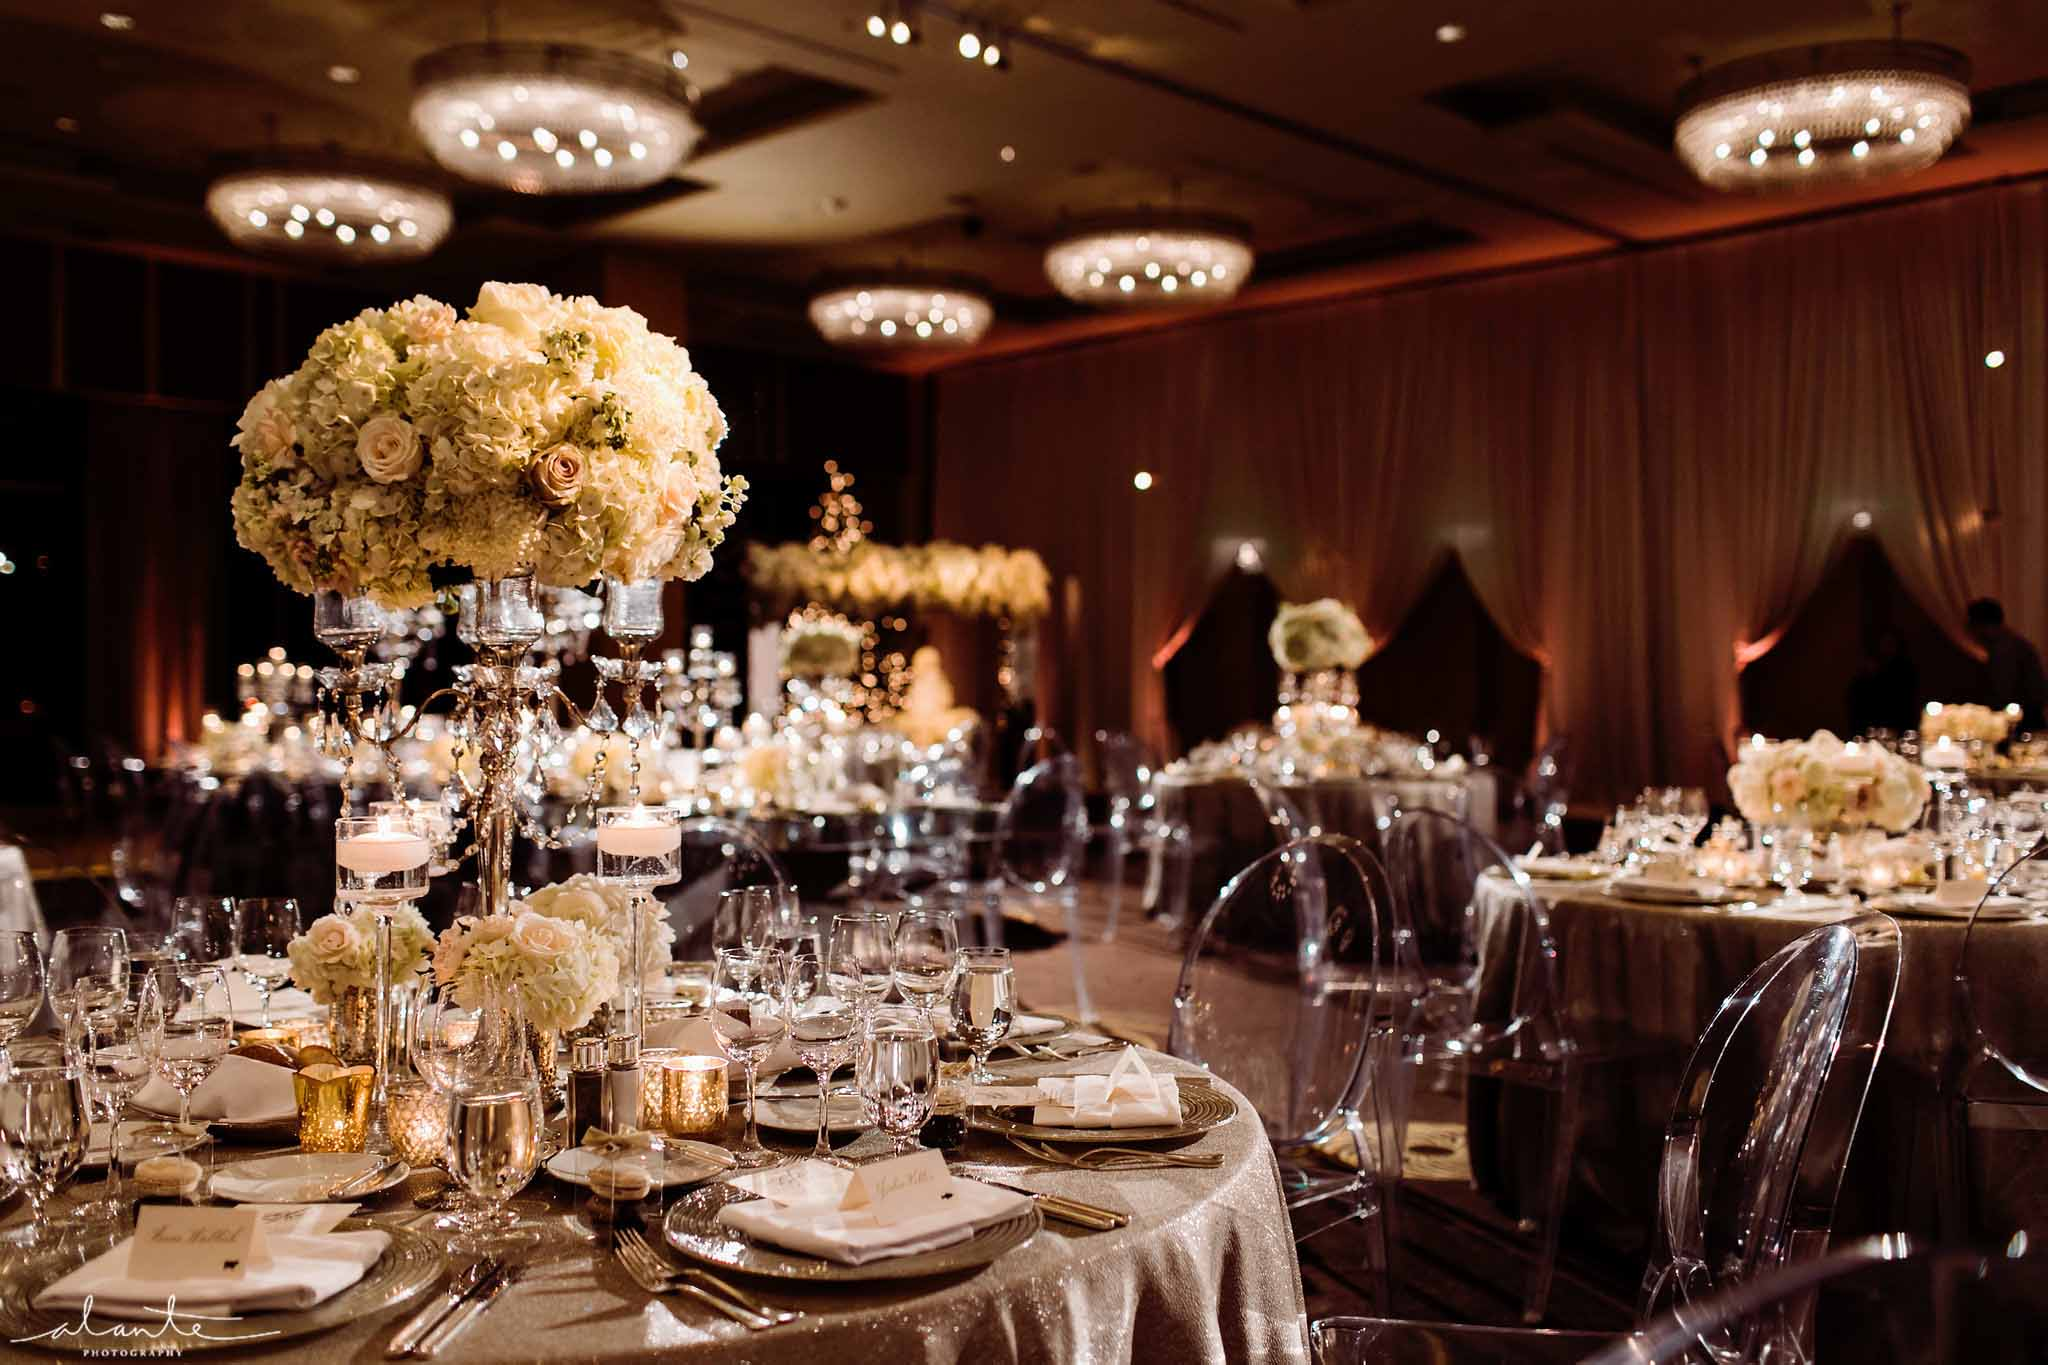 Four Seasons Seattle winter wedding reception - Luxury Winter Wedding at the Four Seasons by Flora Nova Design Seattle